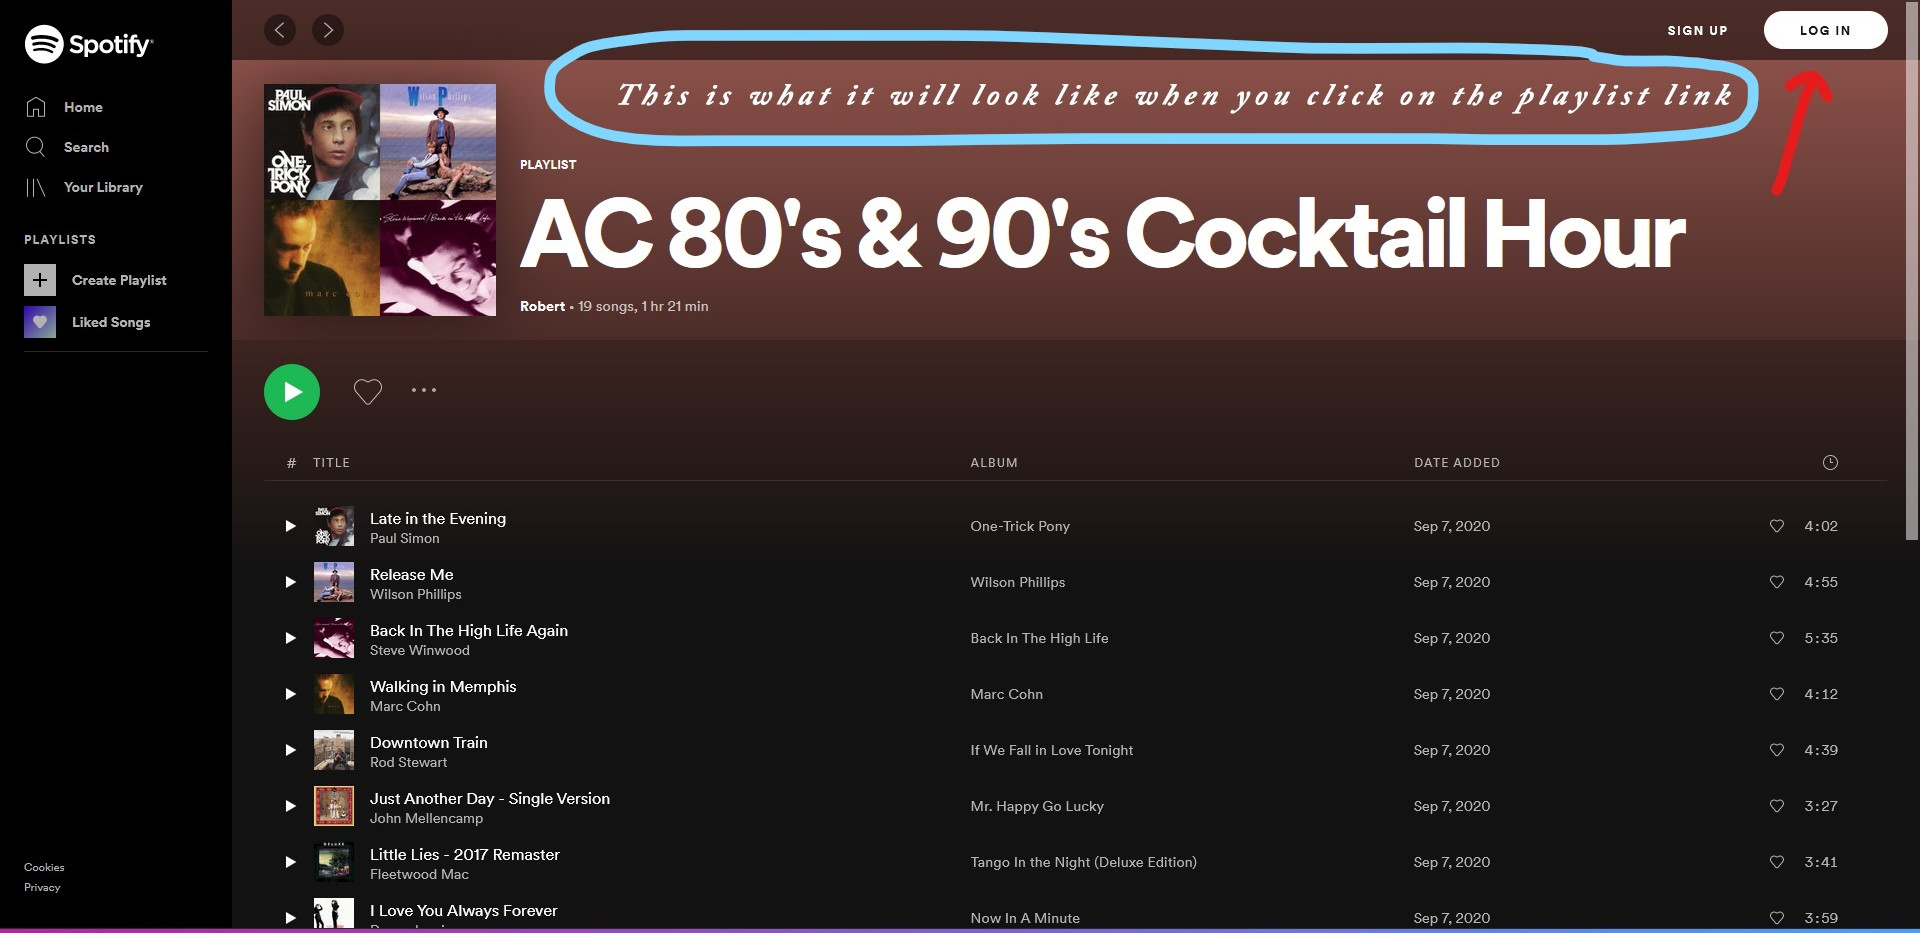 Spotify Website Playlist Page Pre-Login